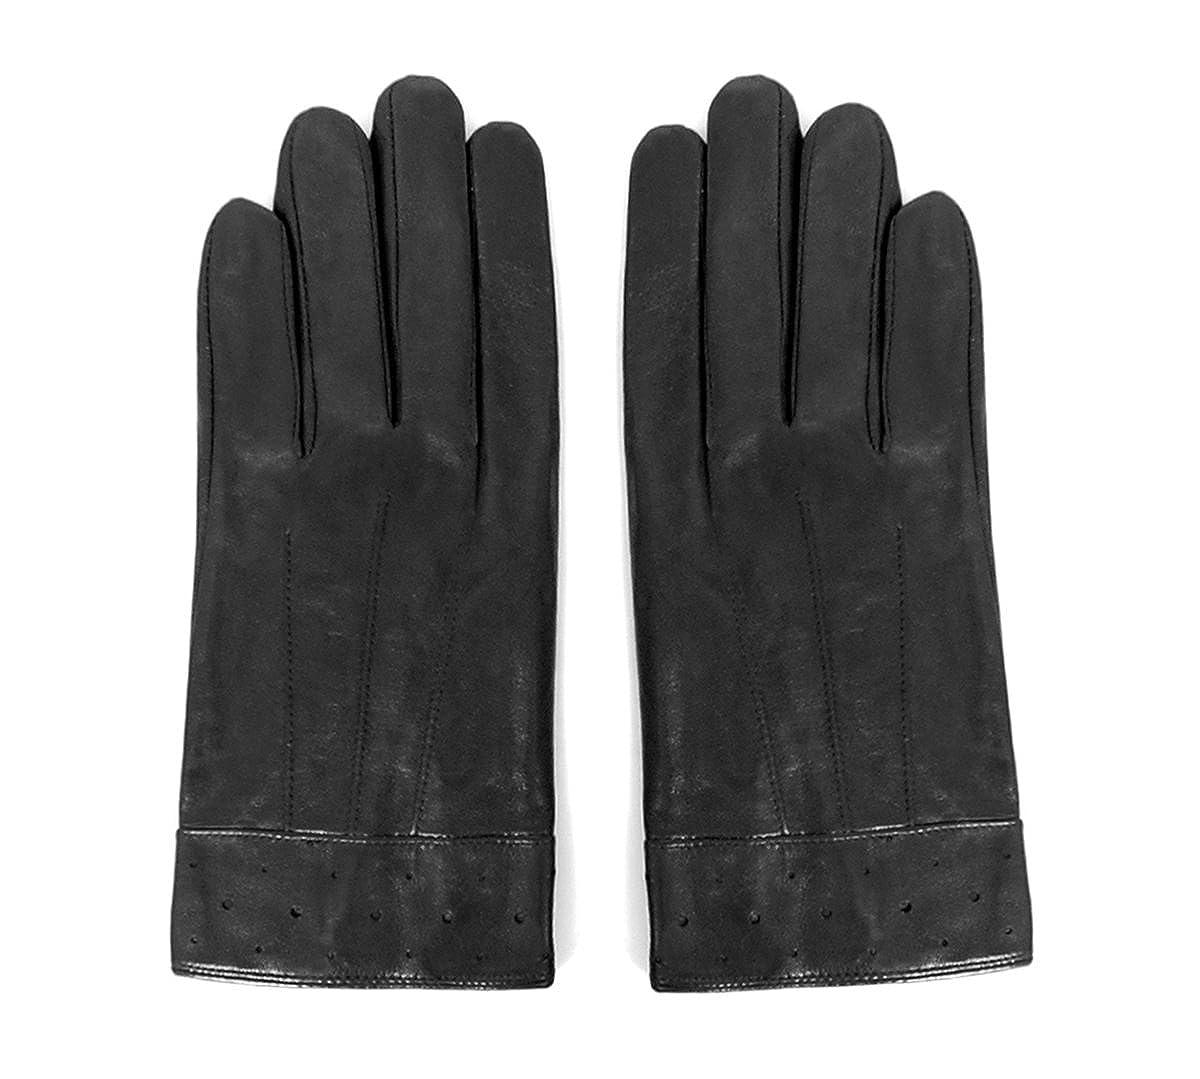 MATSU Men Winter Warm Lambskin Leather Nylon Lined Gloves M1101